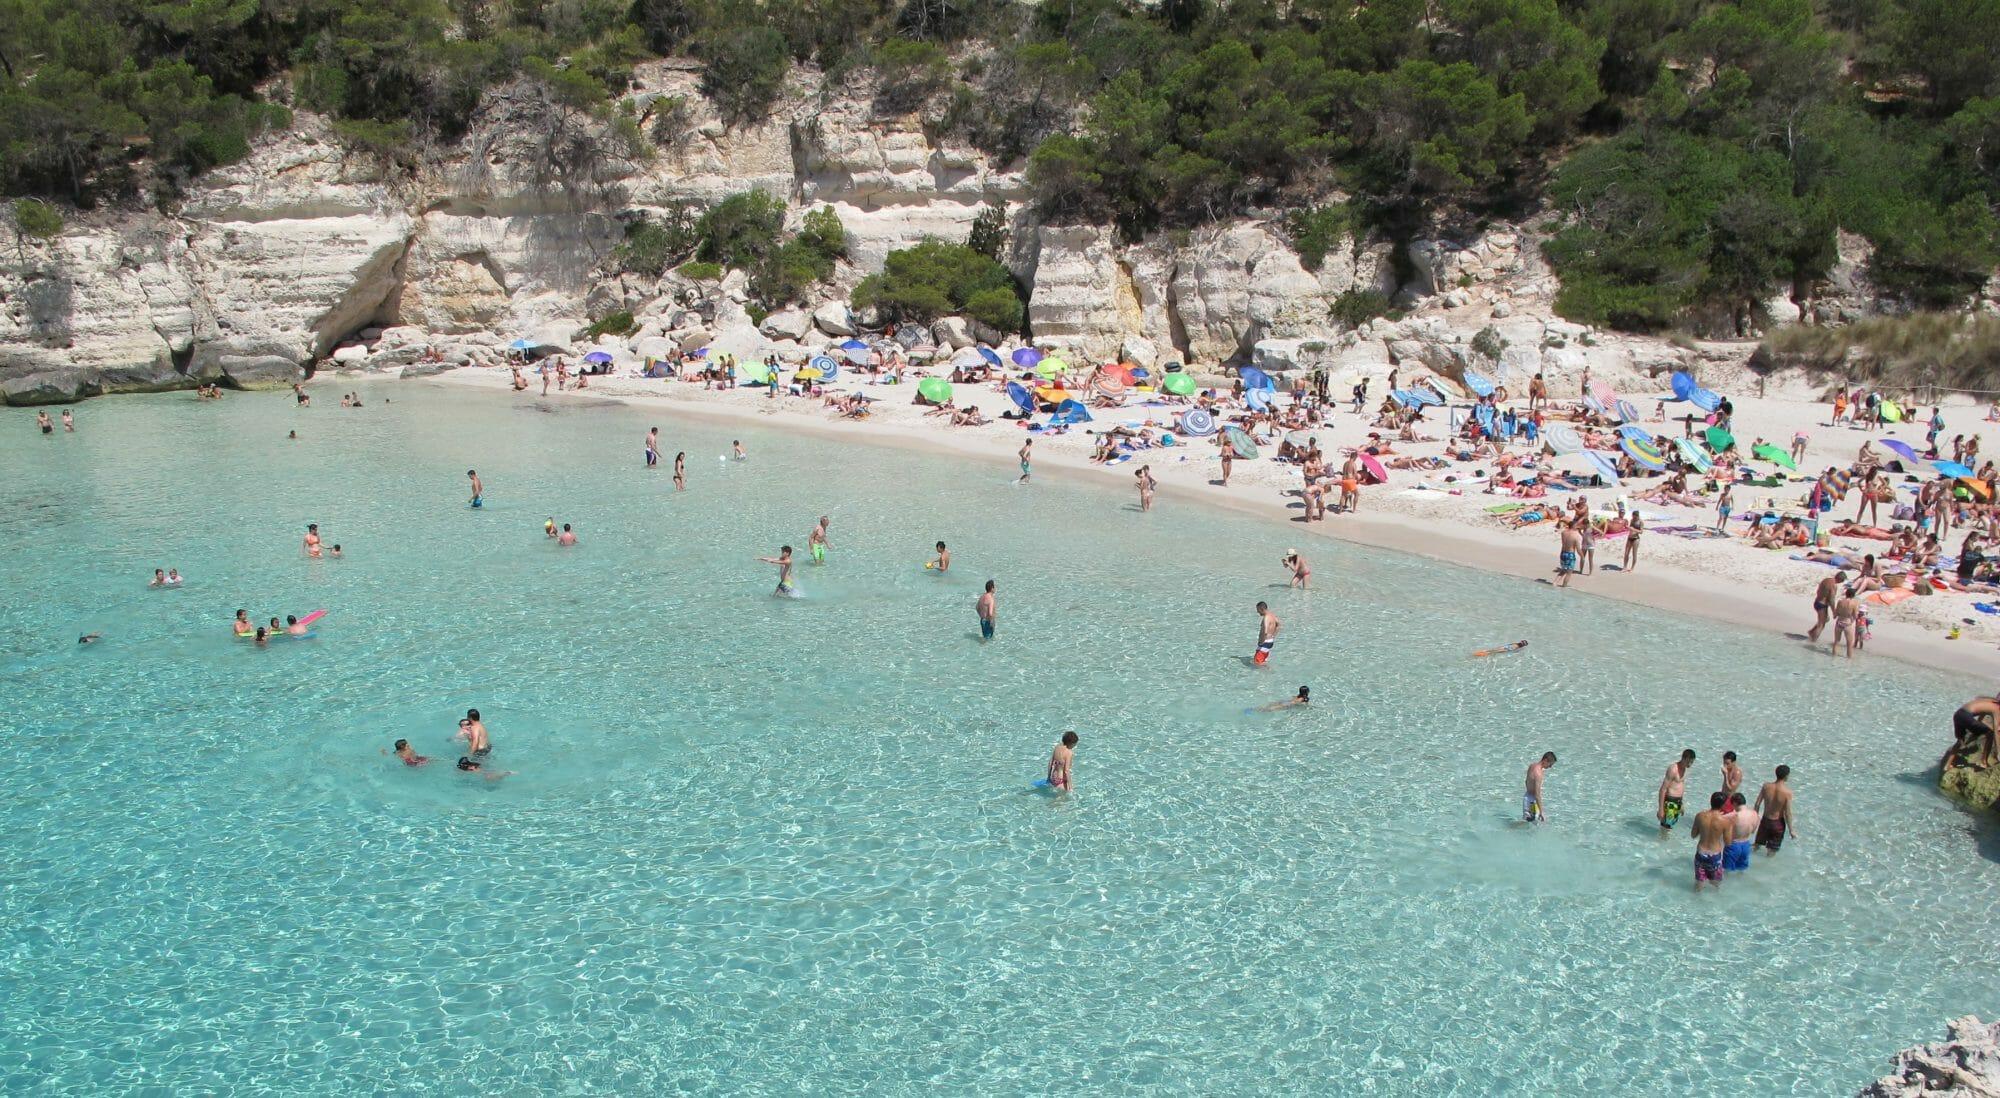 Foto de Cala Mitjana en Menorca vista desde arriba